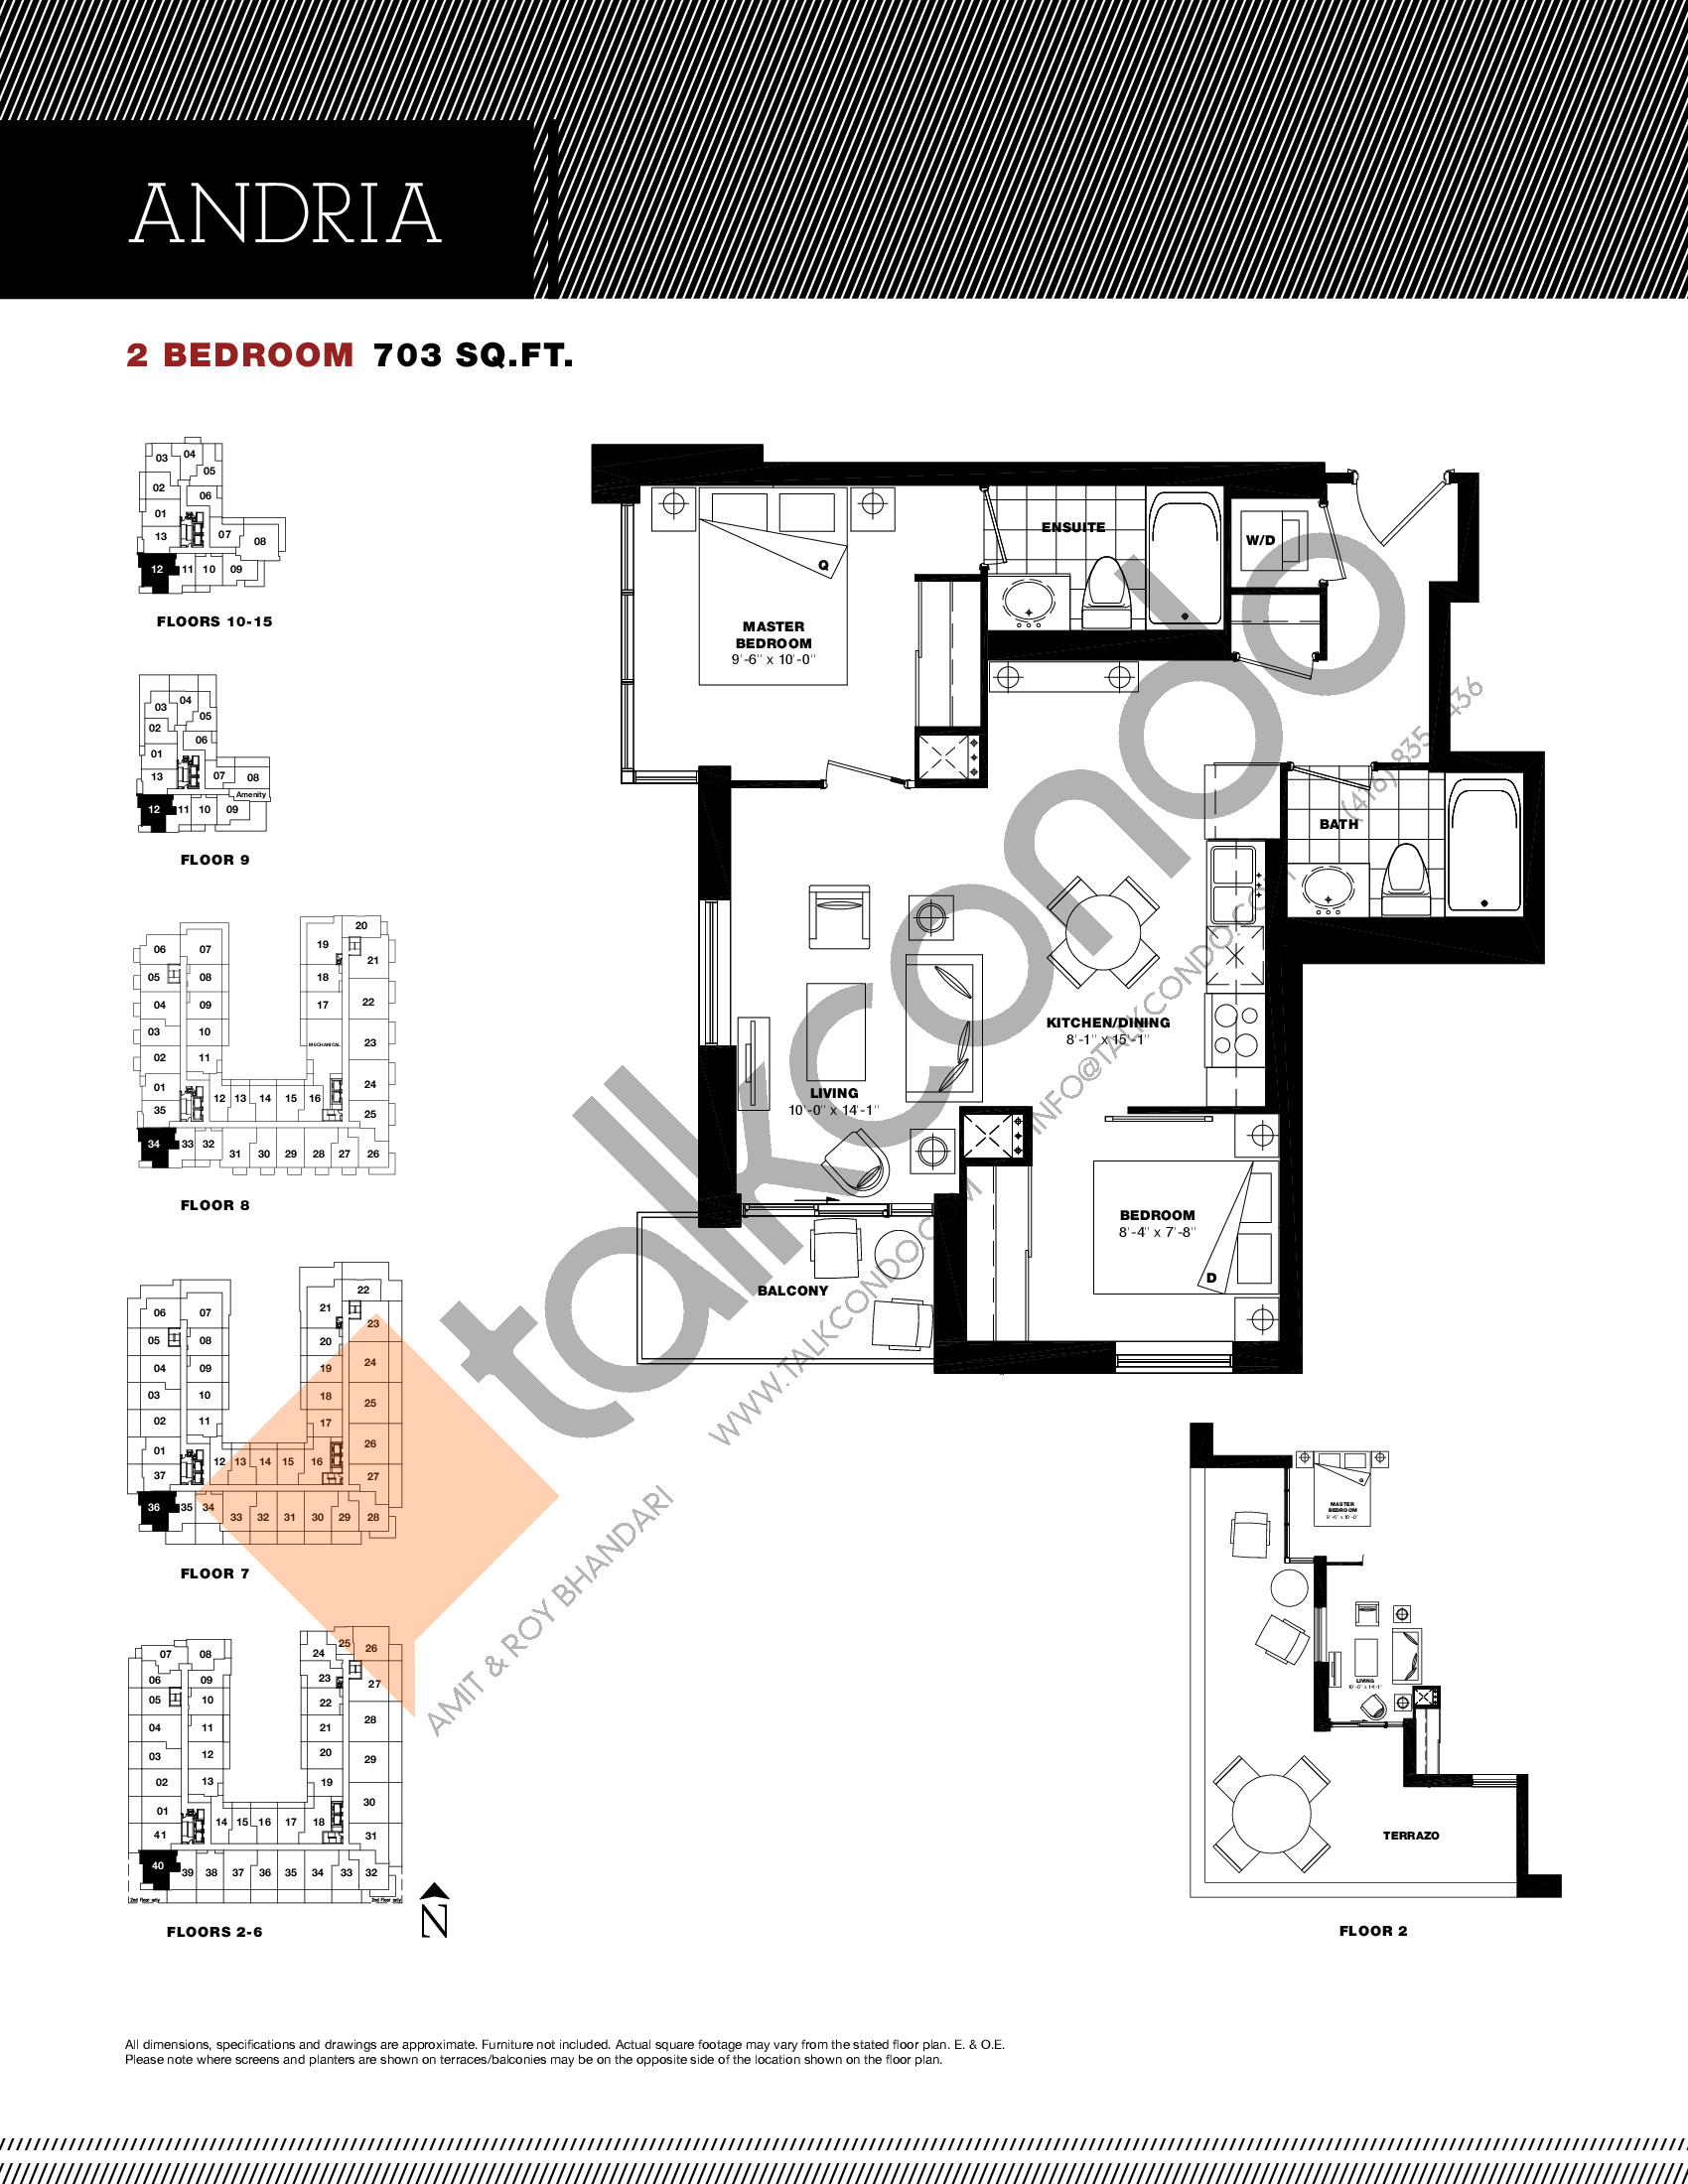 Andria Floor Plan at Residenze Palazzo at Treviso 3 Condos - 703 sq.ft